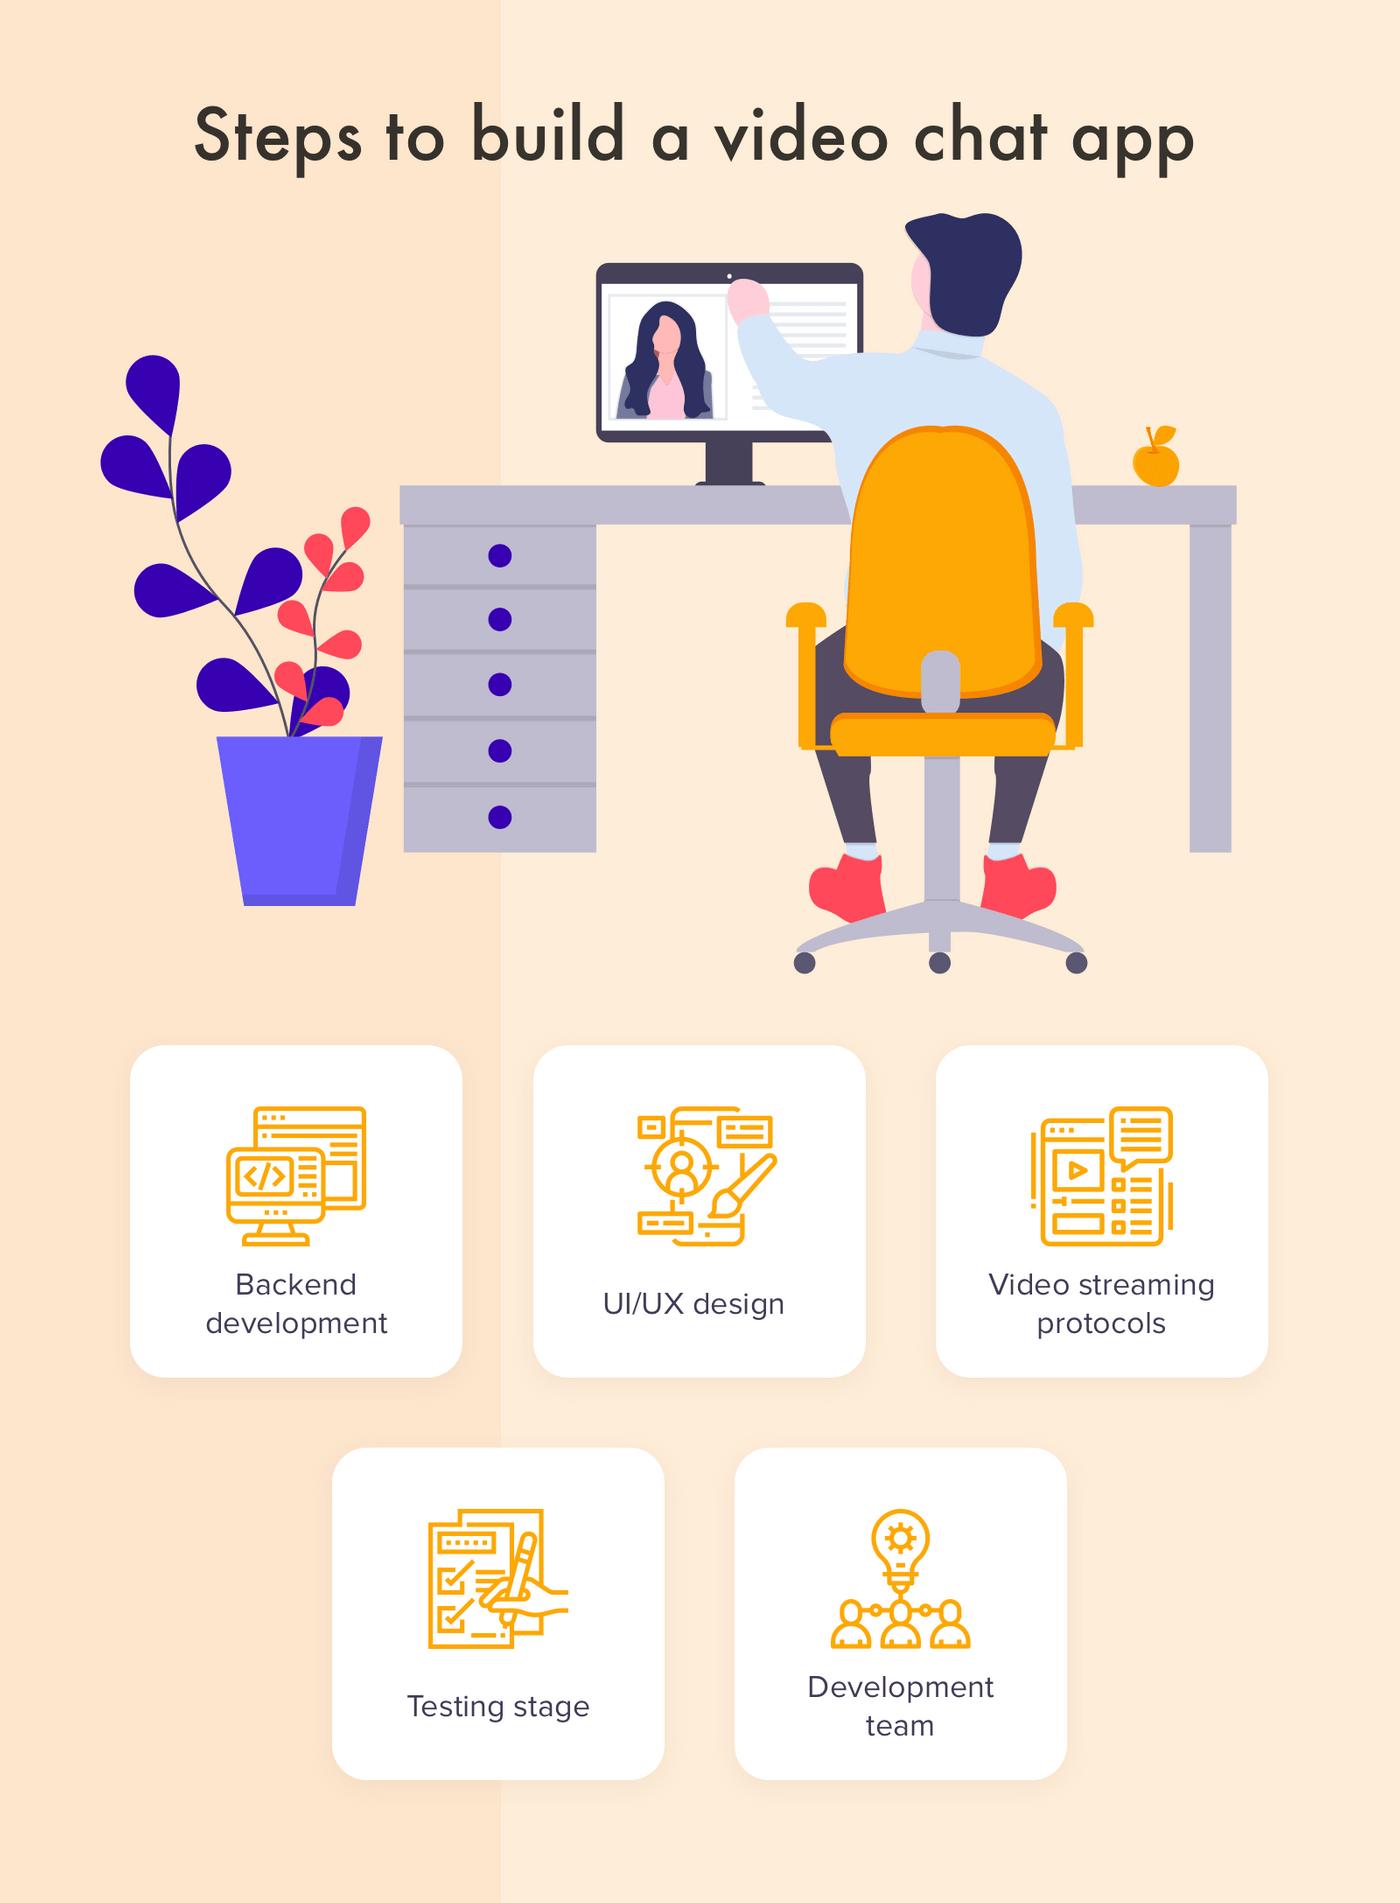 Steps of video chat app development